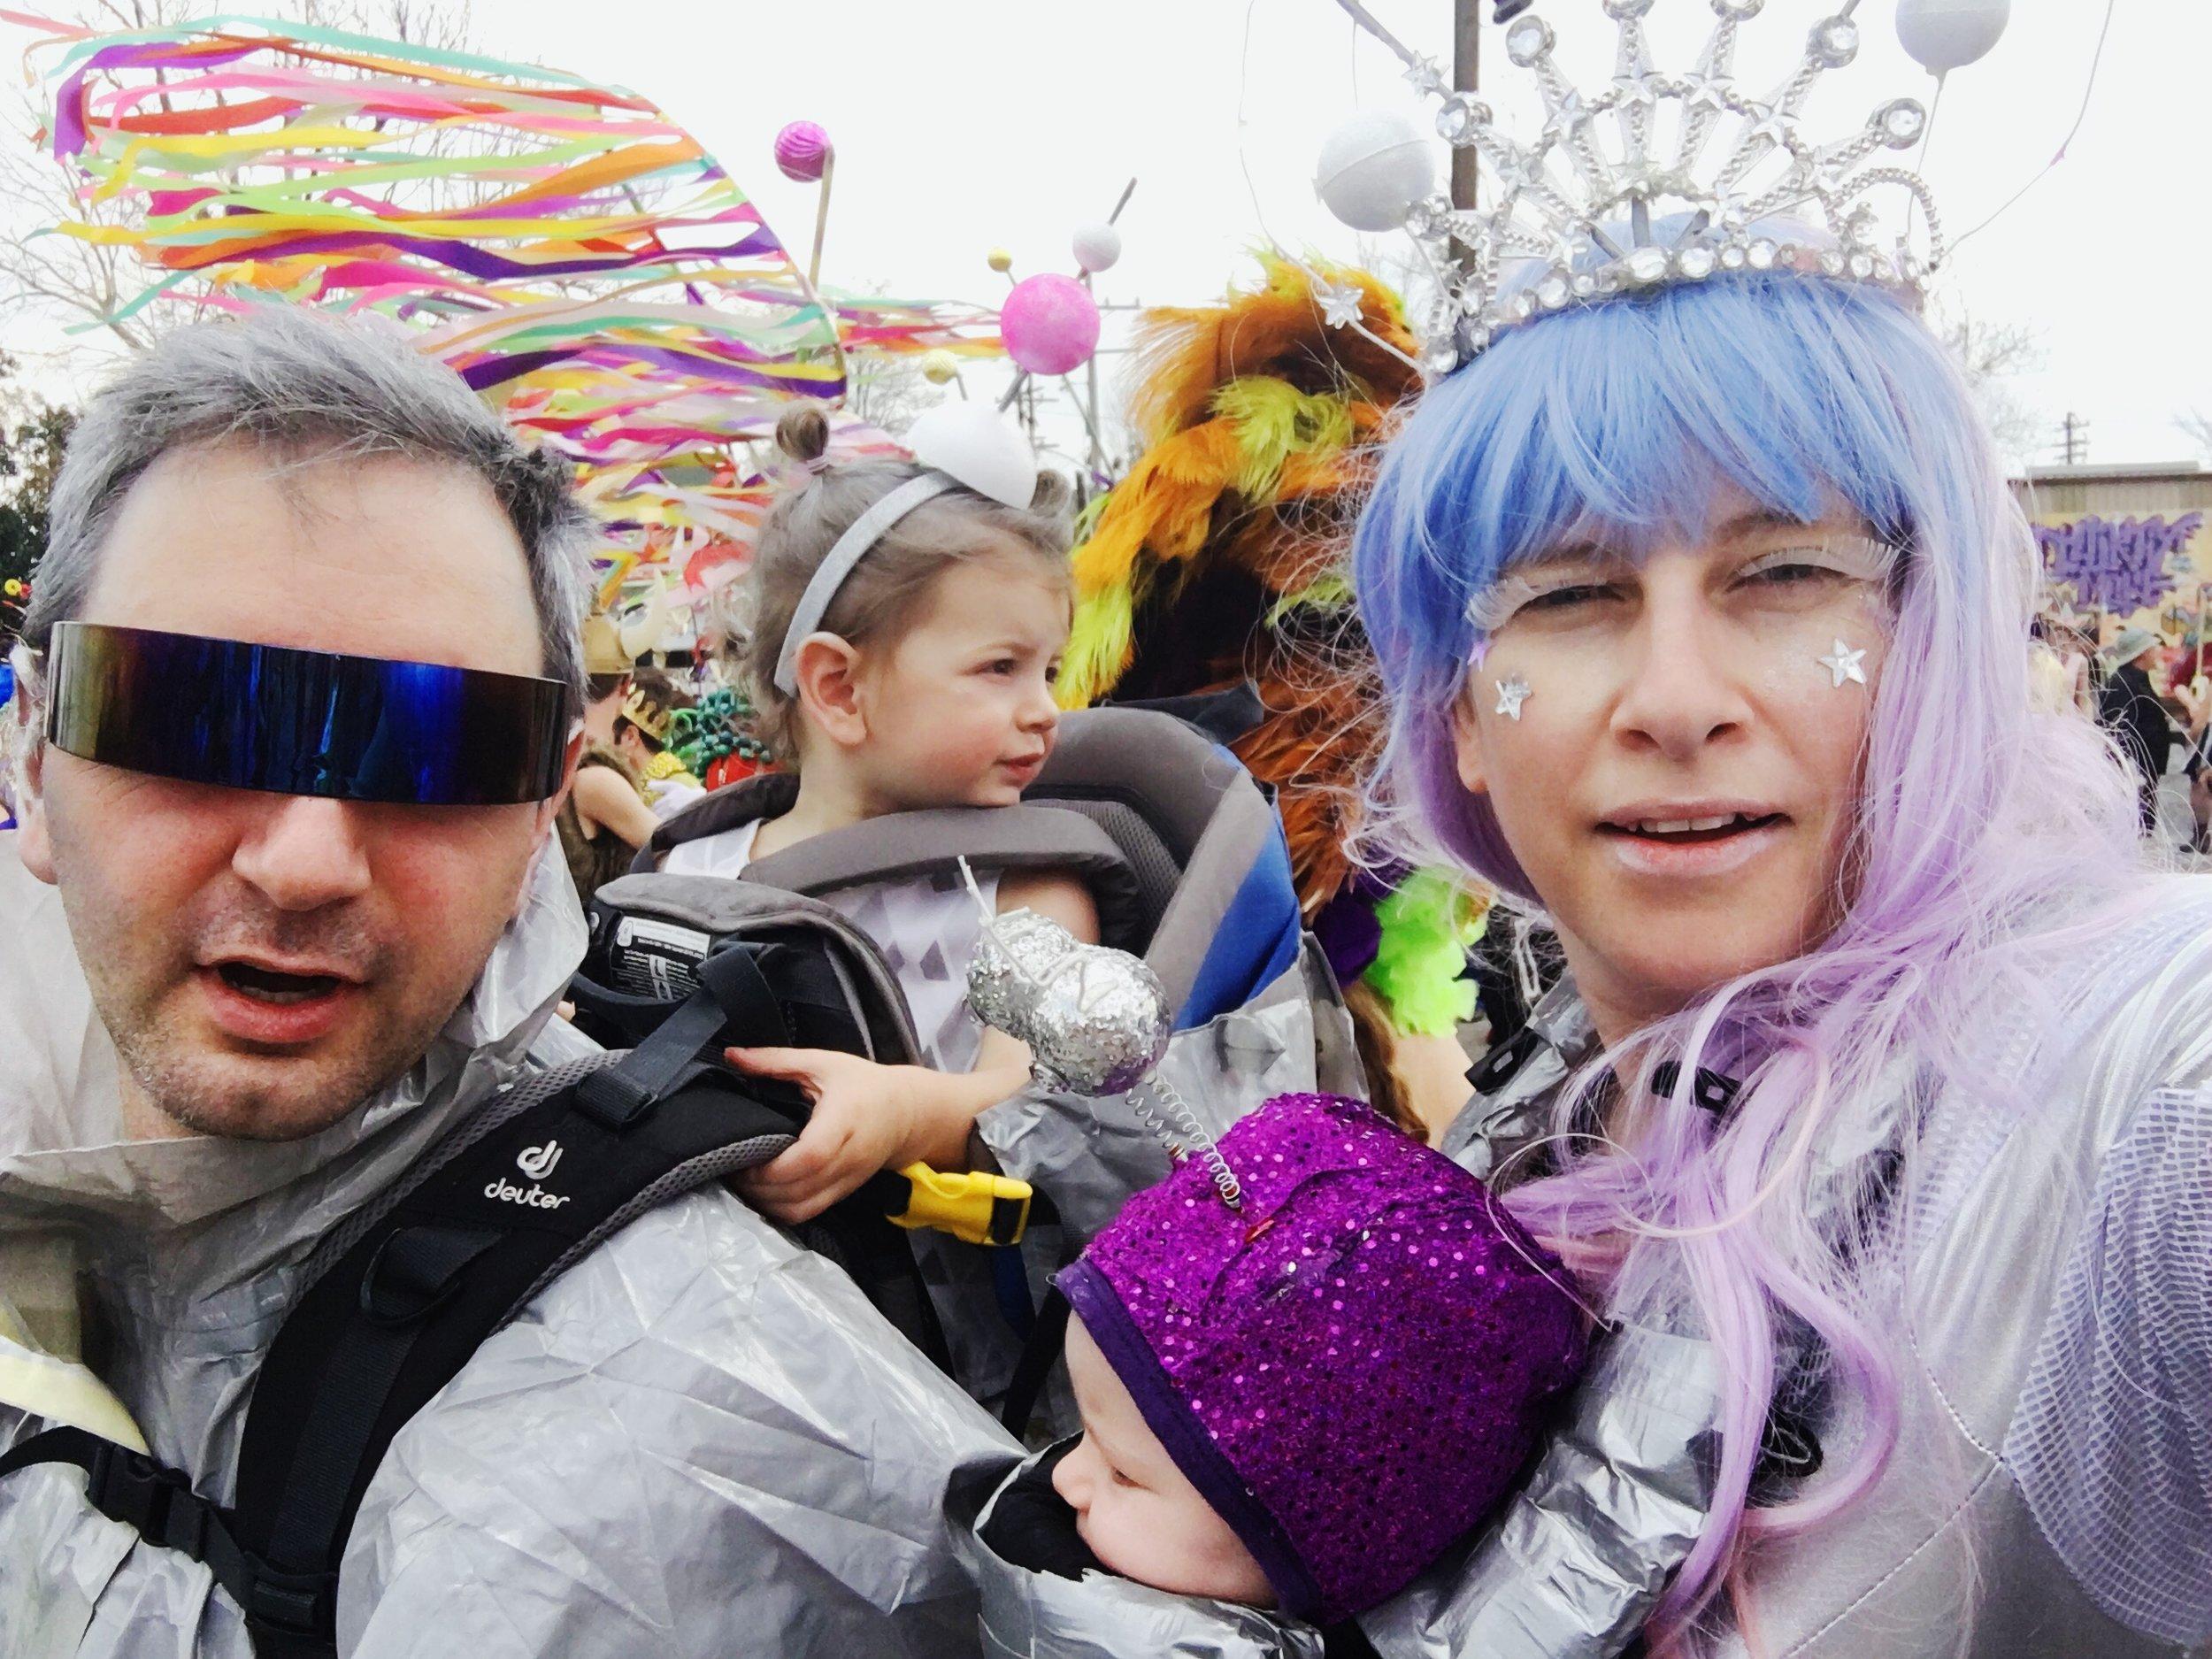 Elizabeth and her krewe, Mardi Gras 2017